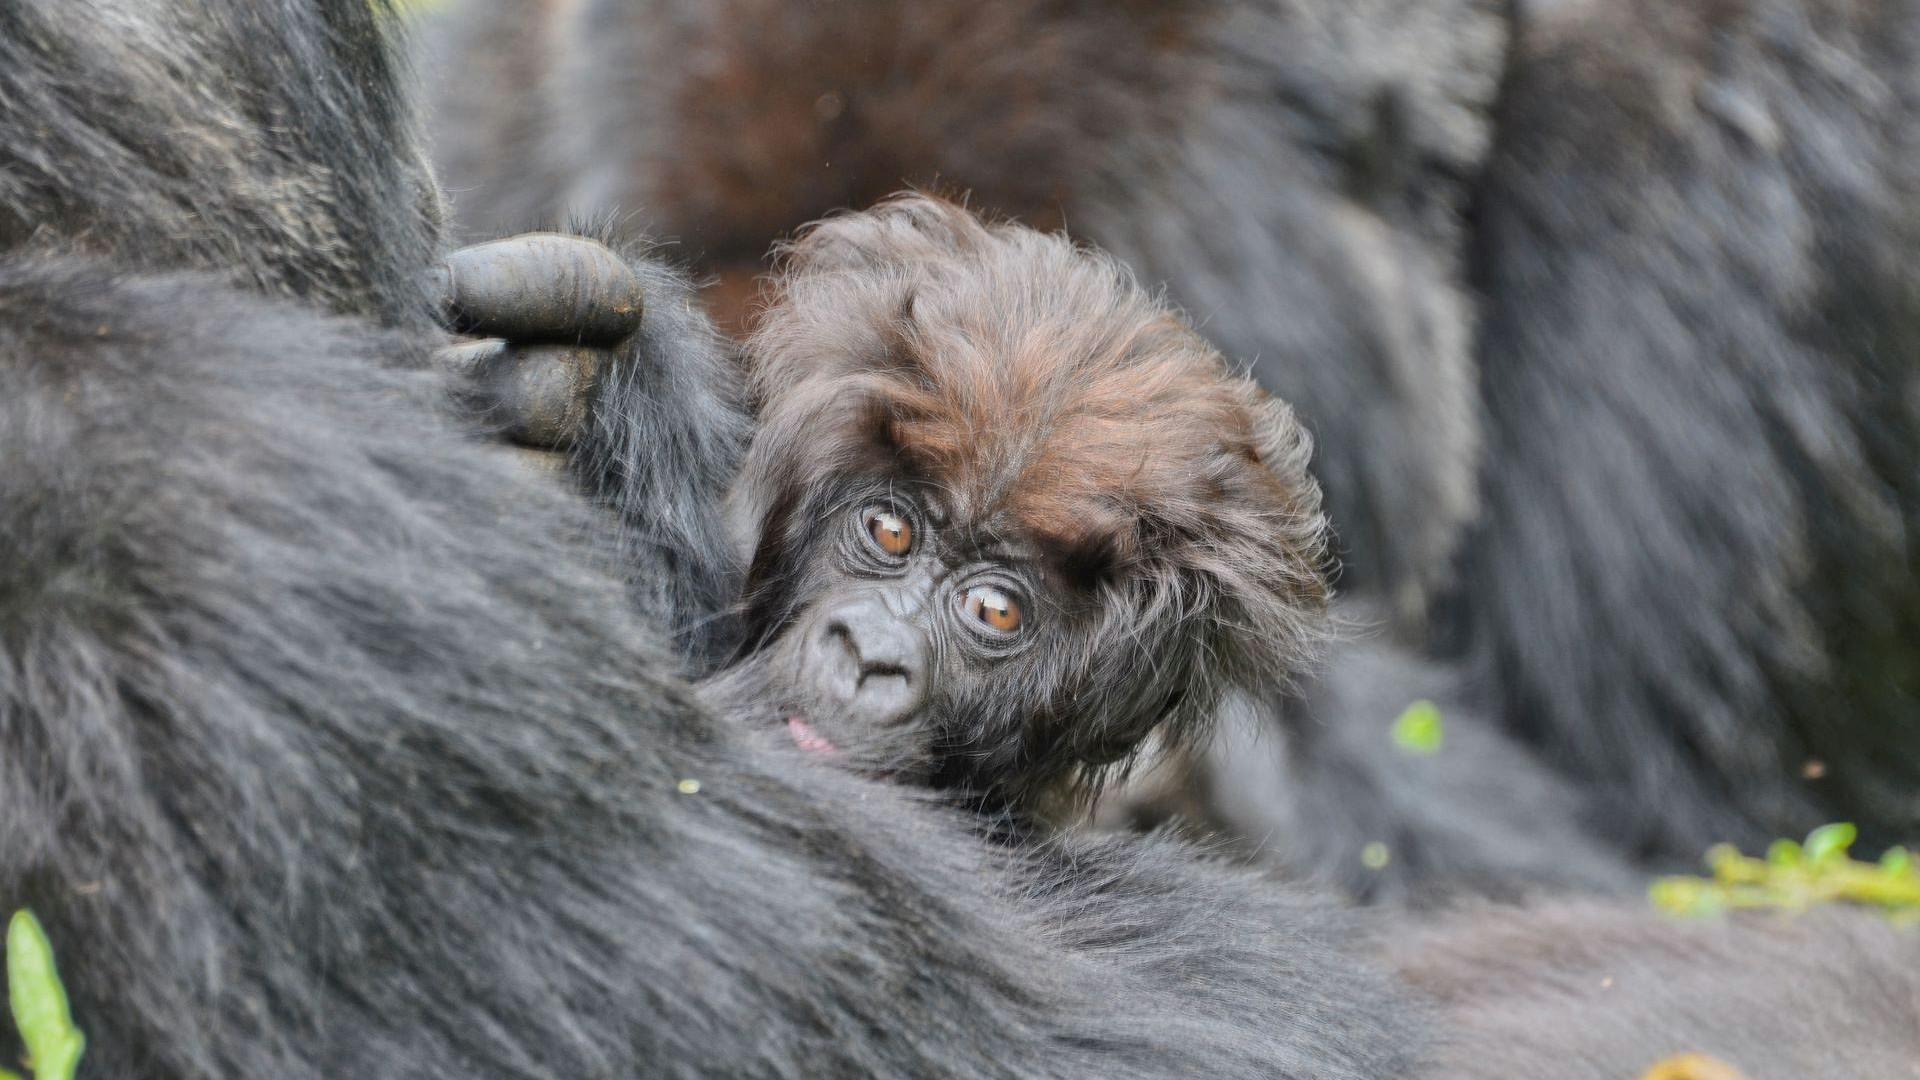 GameStop Redditors are using their stock winnings to adopt gorillas